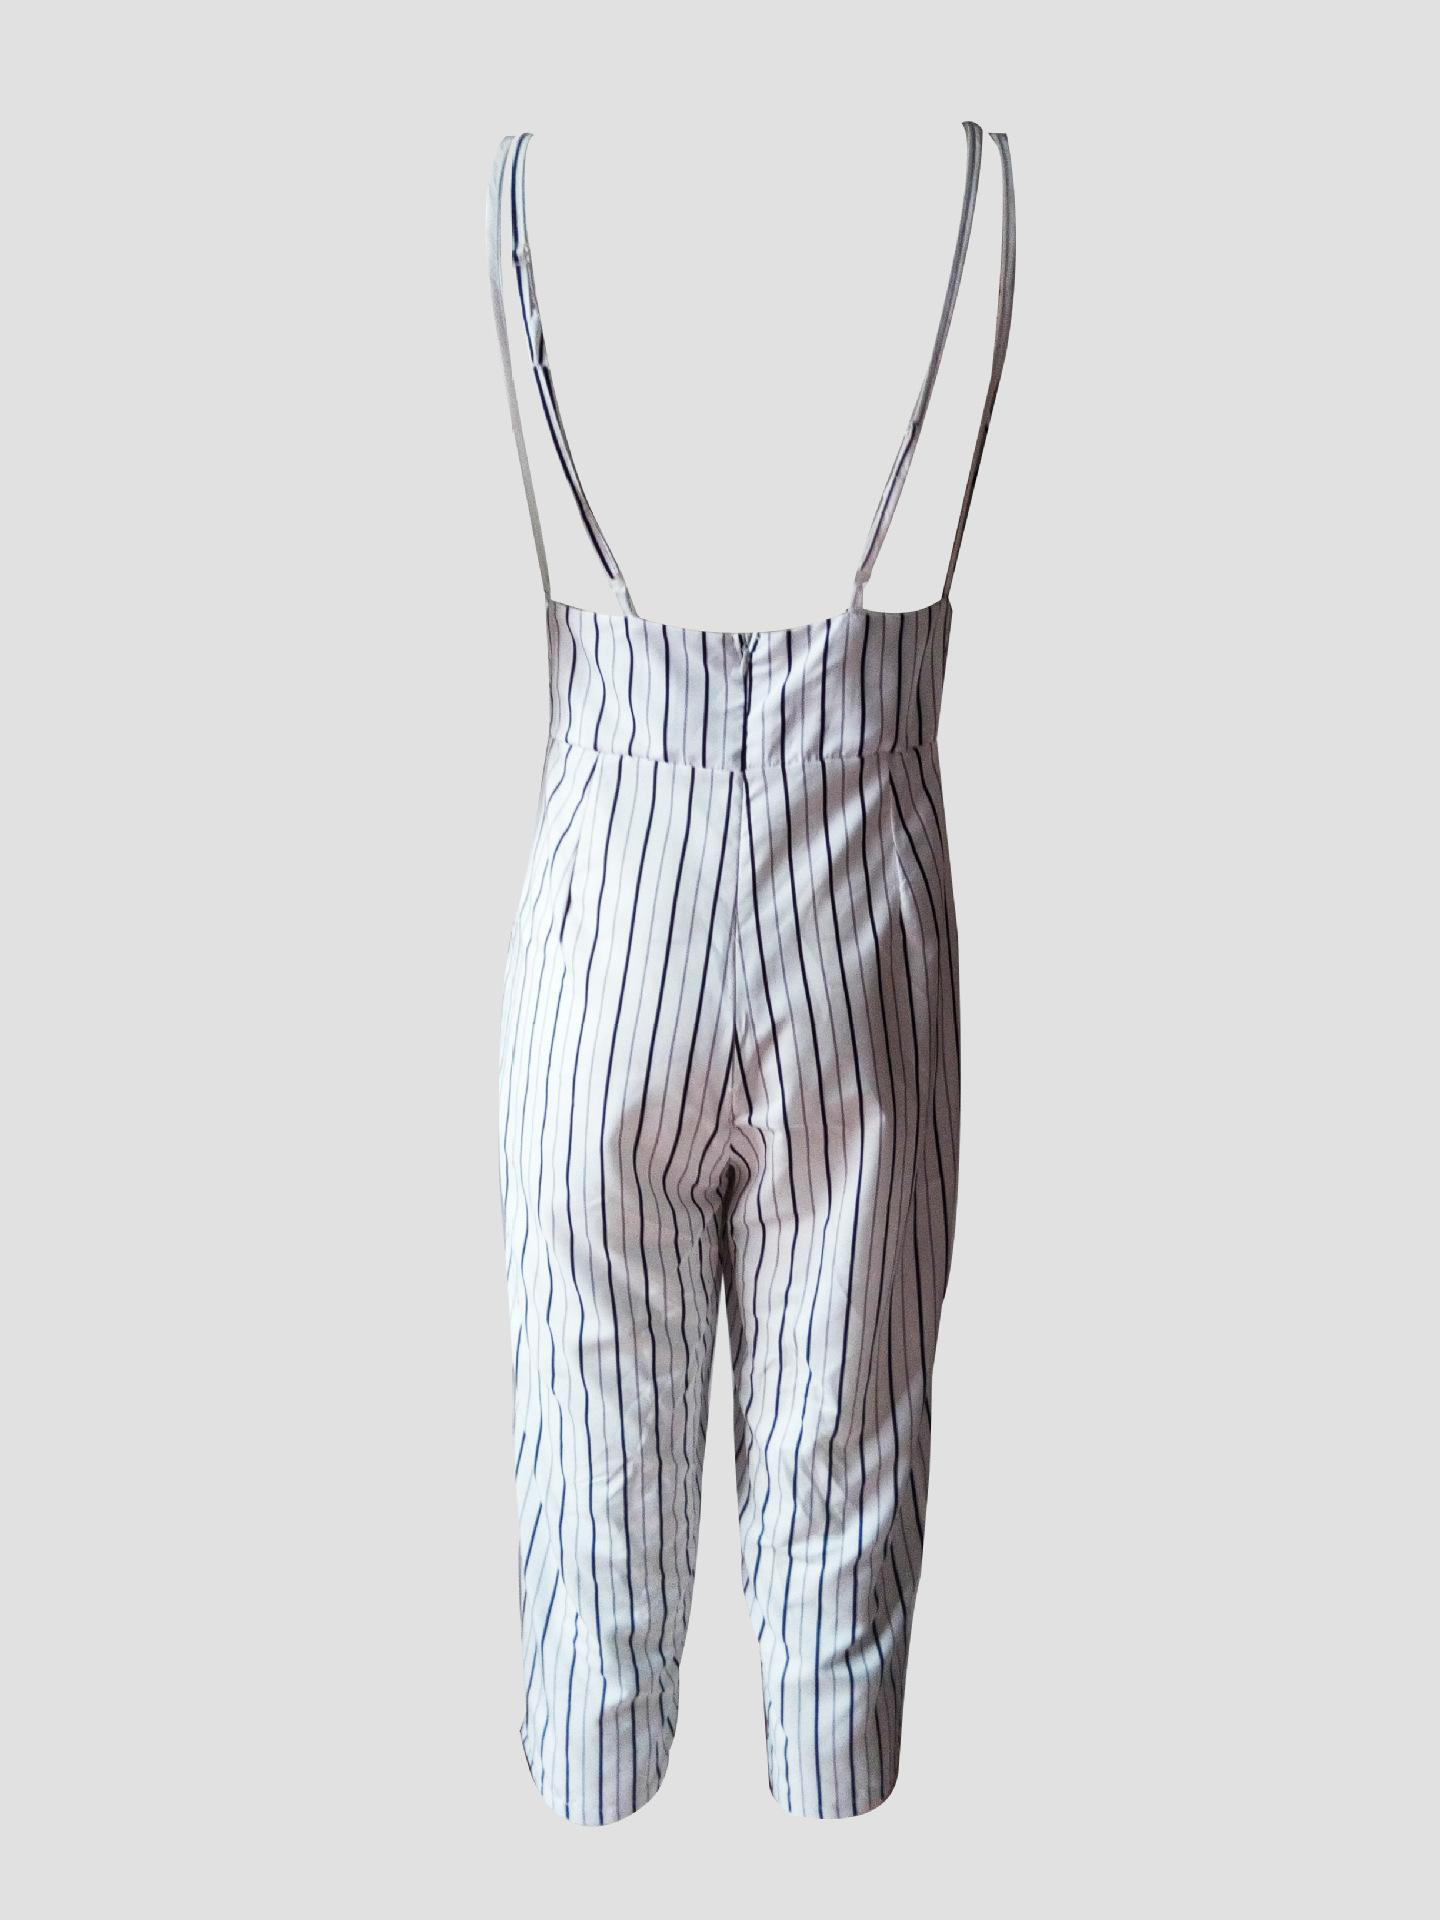 HTB14uNxSXXXXXa3apXXq6xXFXXXr - FREE SHIPPING Women V-Neck Backless Strapless Striped Romper Playsuit Bodycon Club Jumpsuit Tops Outfits Sunsuit JKP377